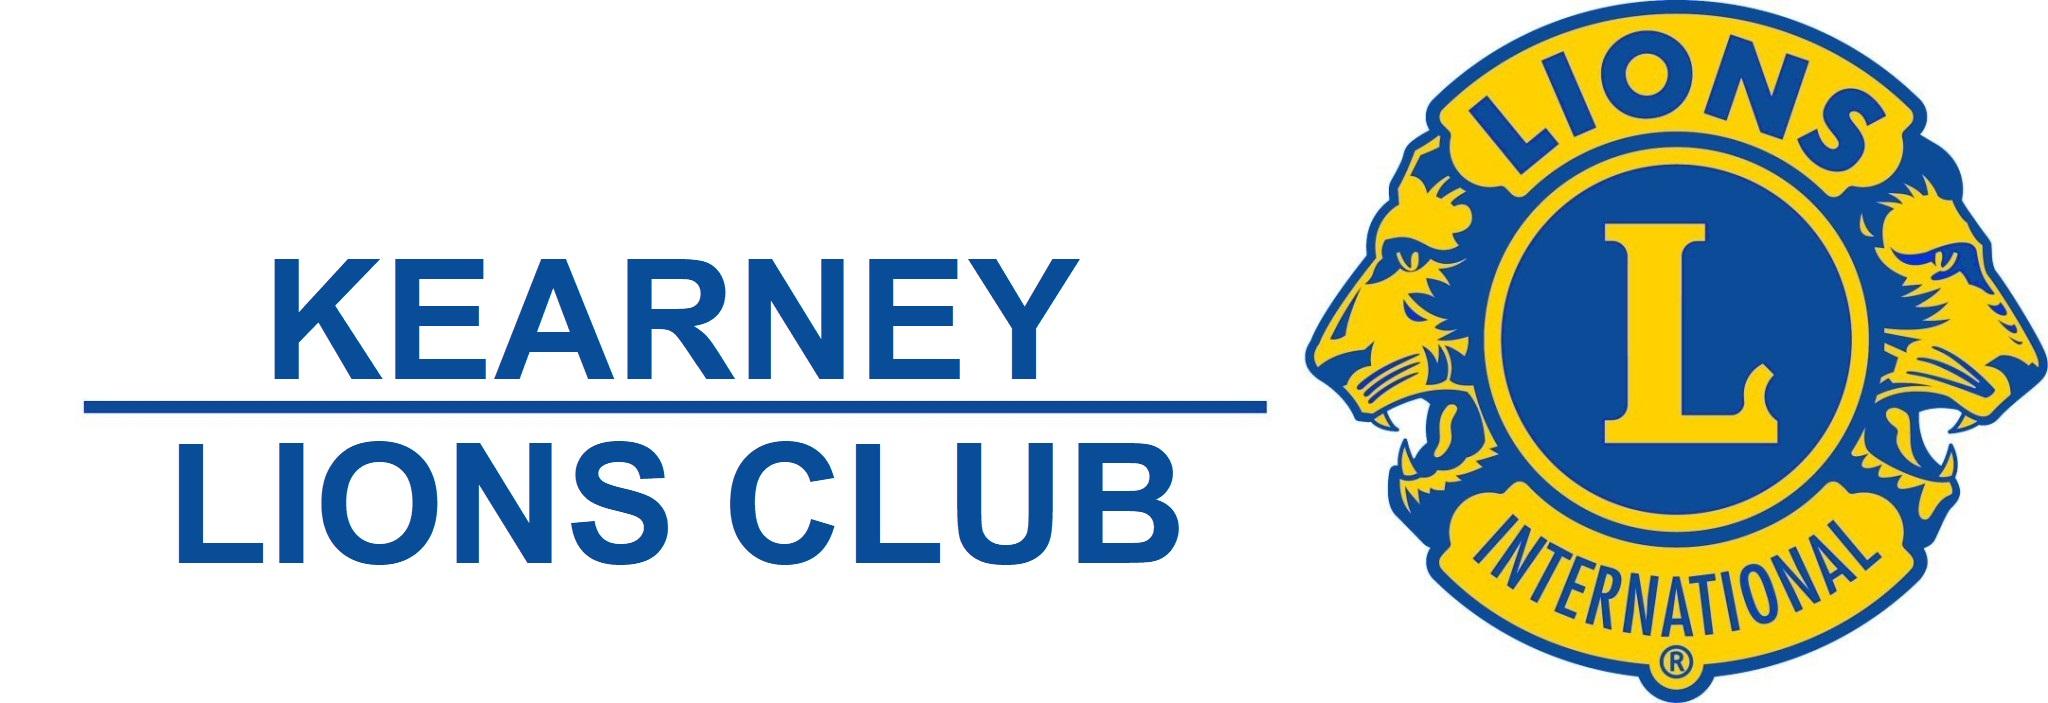 Kearney Lions Club Header